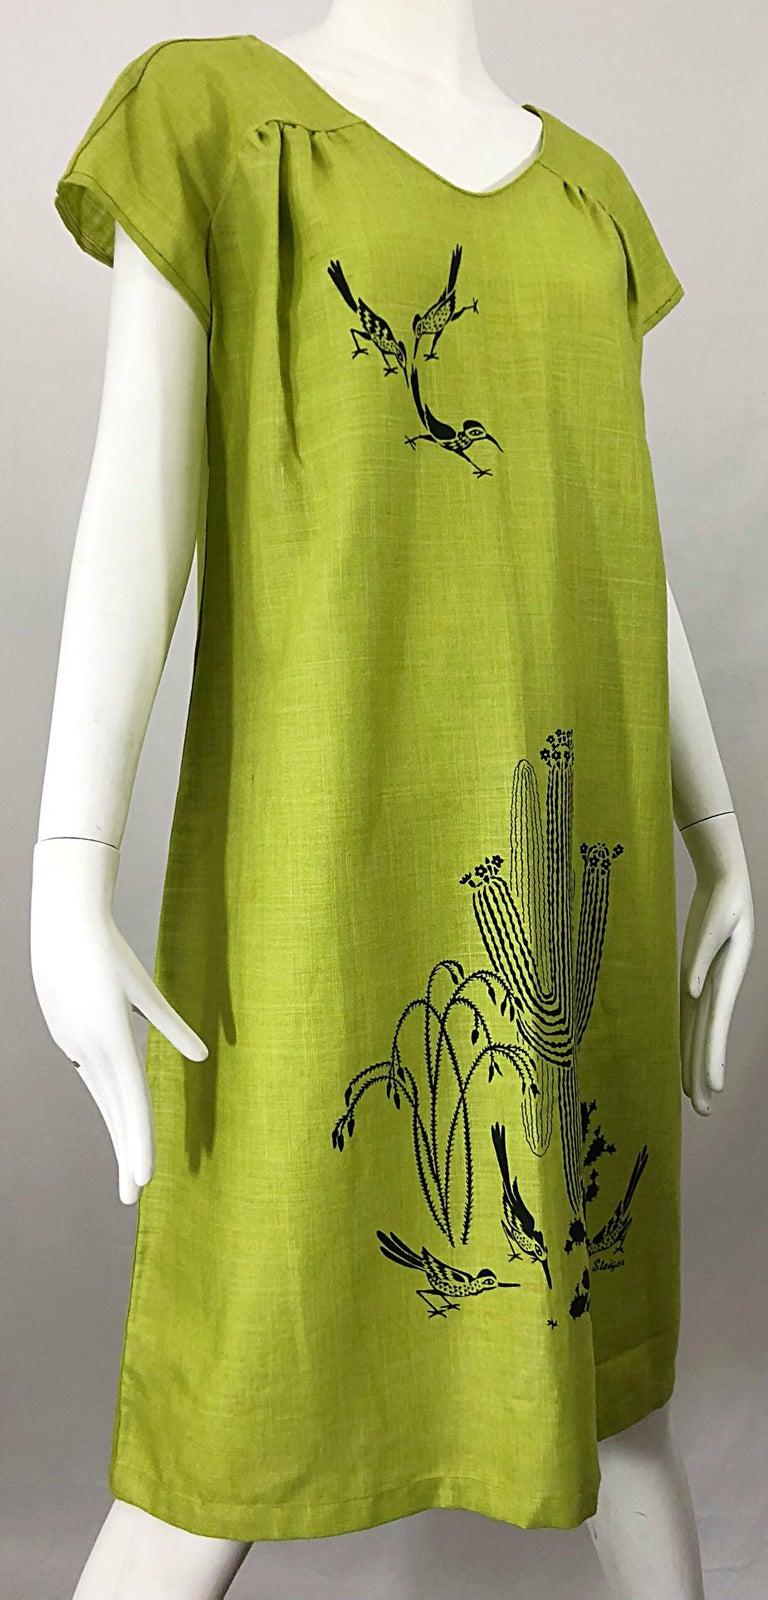 Rare 1970s Harwood Steiger Screen Printed Ant Eater Novelty Linen Tunic Dress For Sale 9